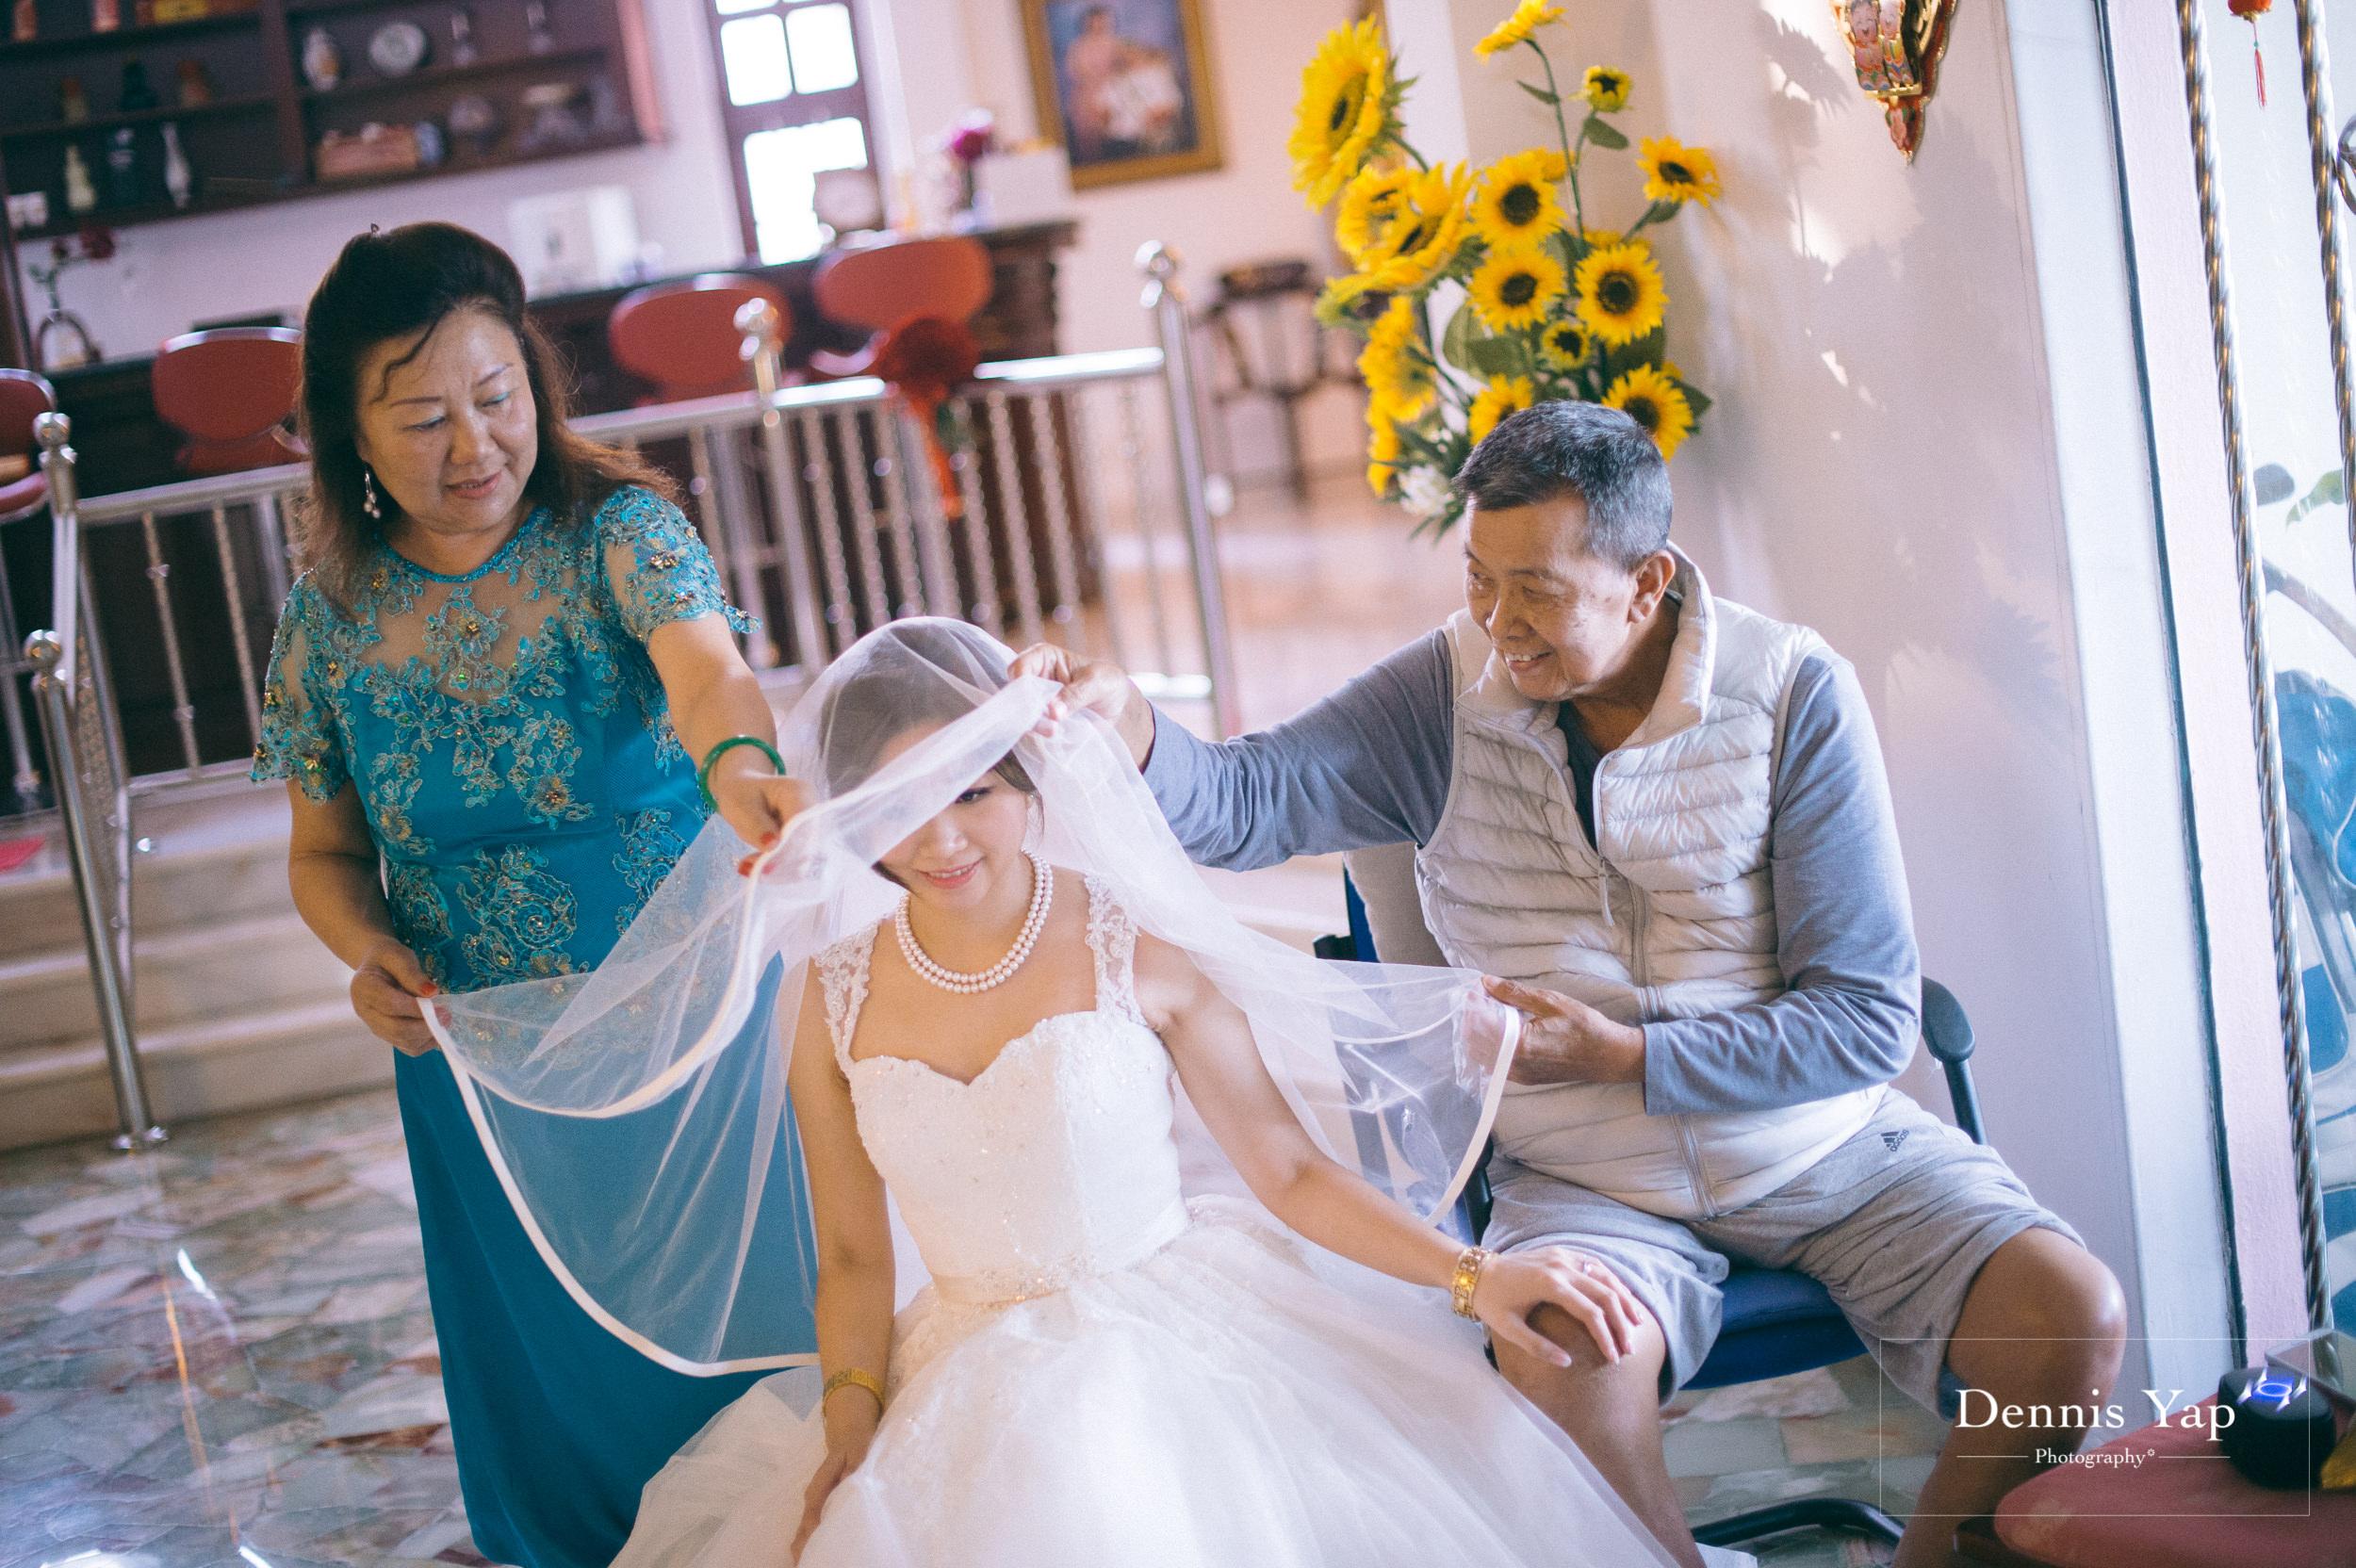 taylai cheng yee wedding day tropicana gold and country club damansara dennis yap photography-4.jpg